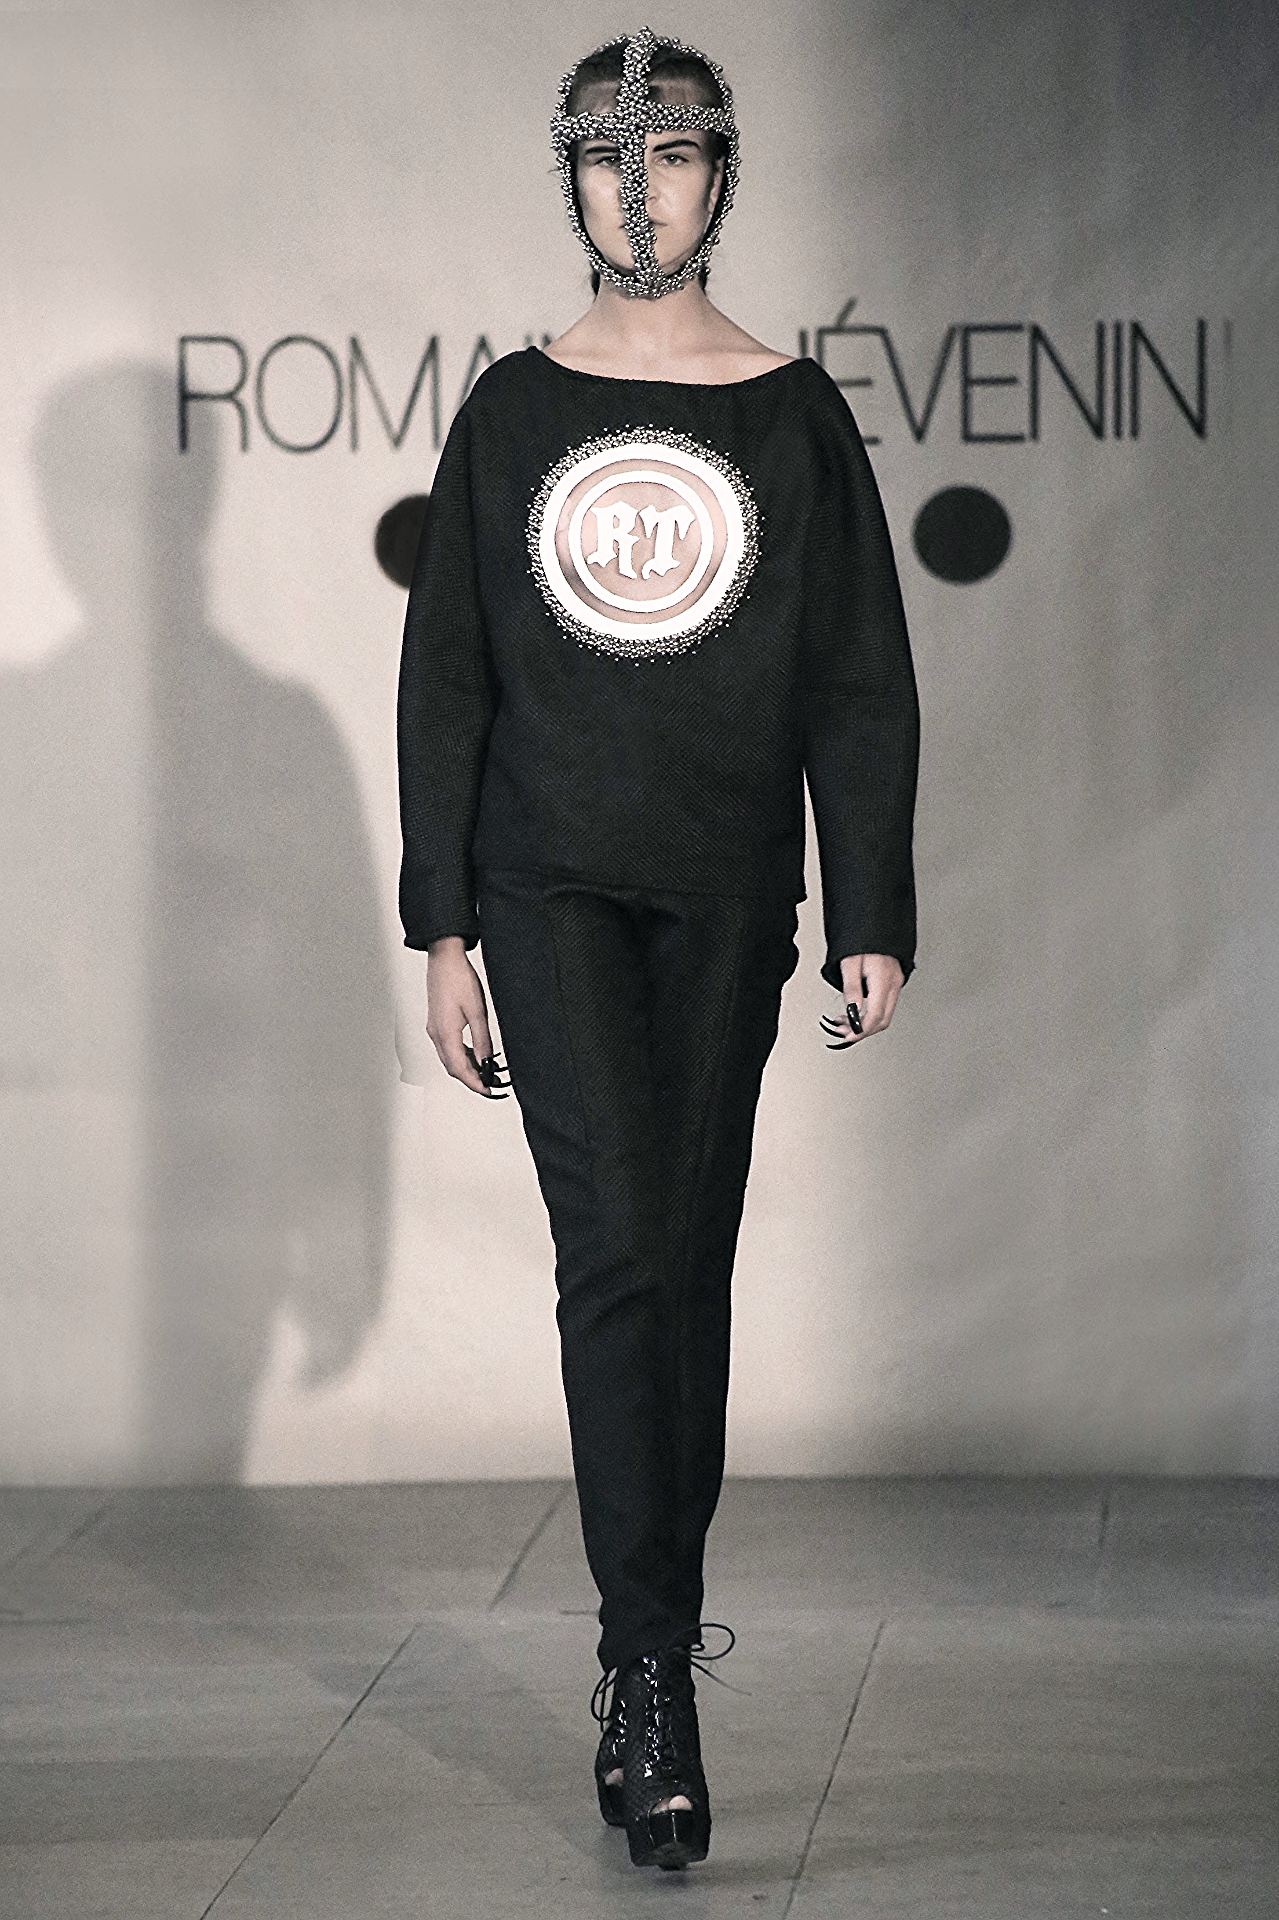 Romain Thevenin Pariconstance_edited